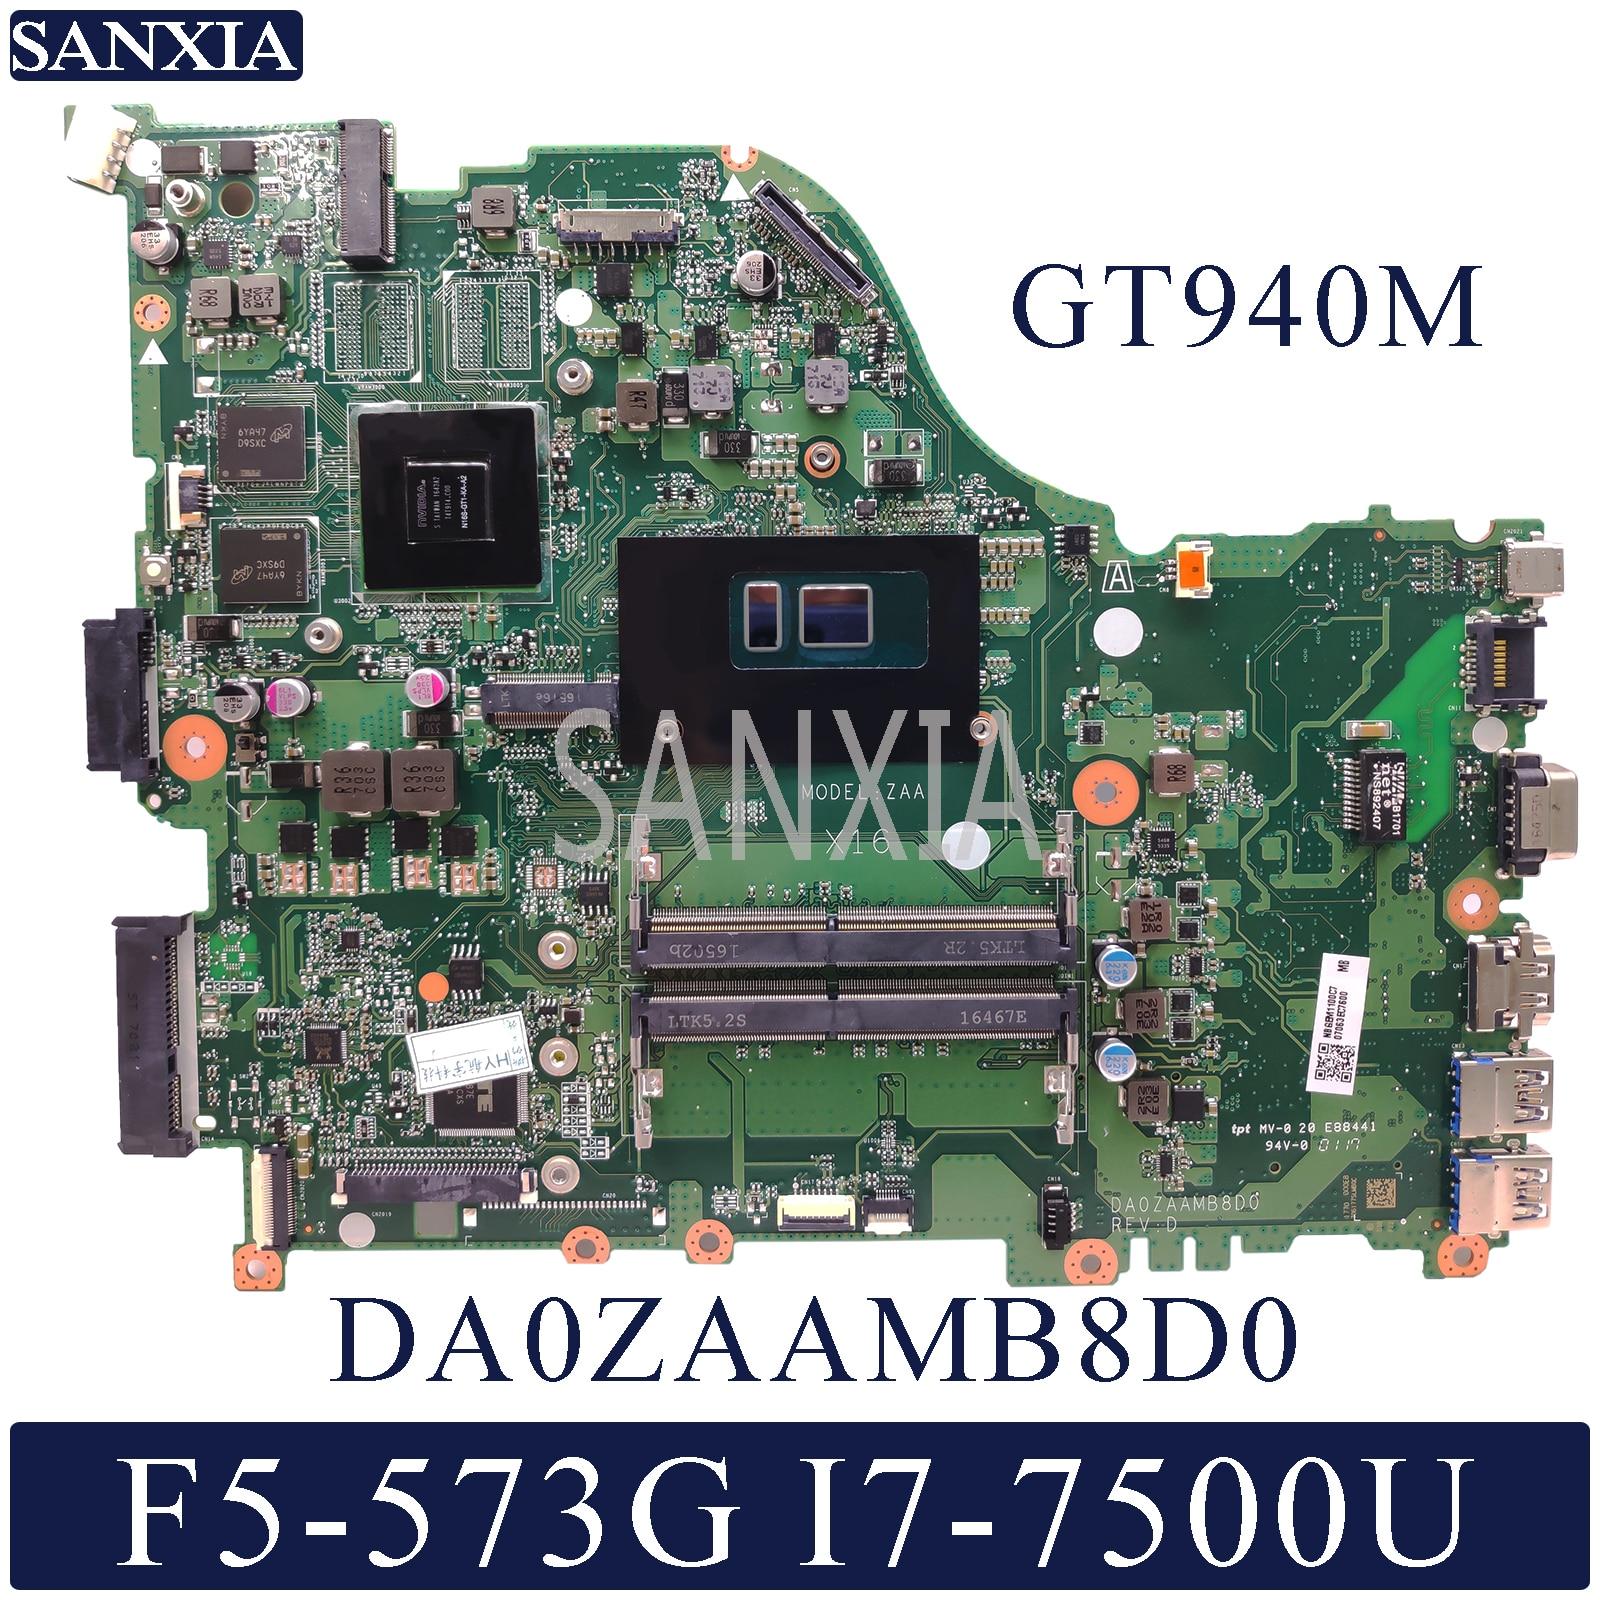 KEFU DA0ZAAMB8D0 Laptop motherboard for font b Acer b font Aspire F5 573G Test original mainboard